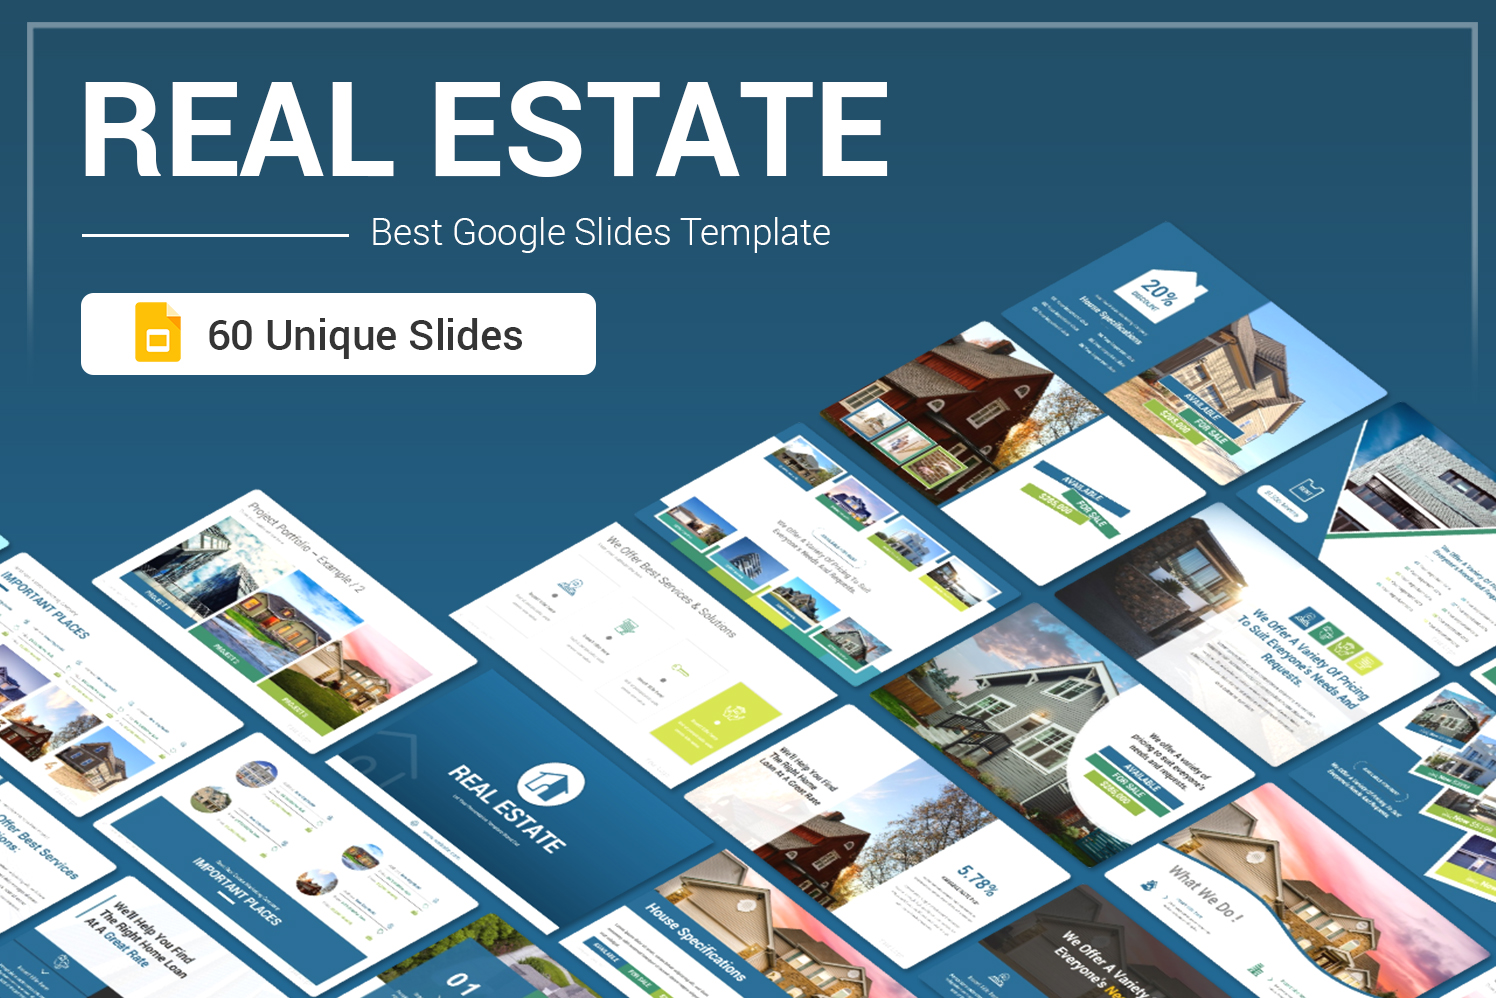 Premium Real Estate Google Slides #104310